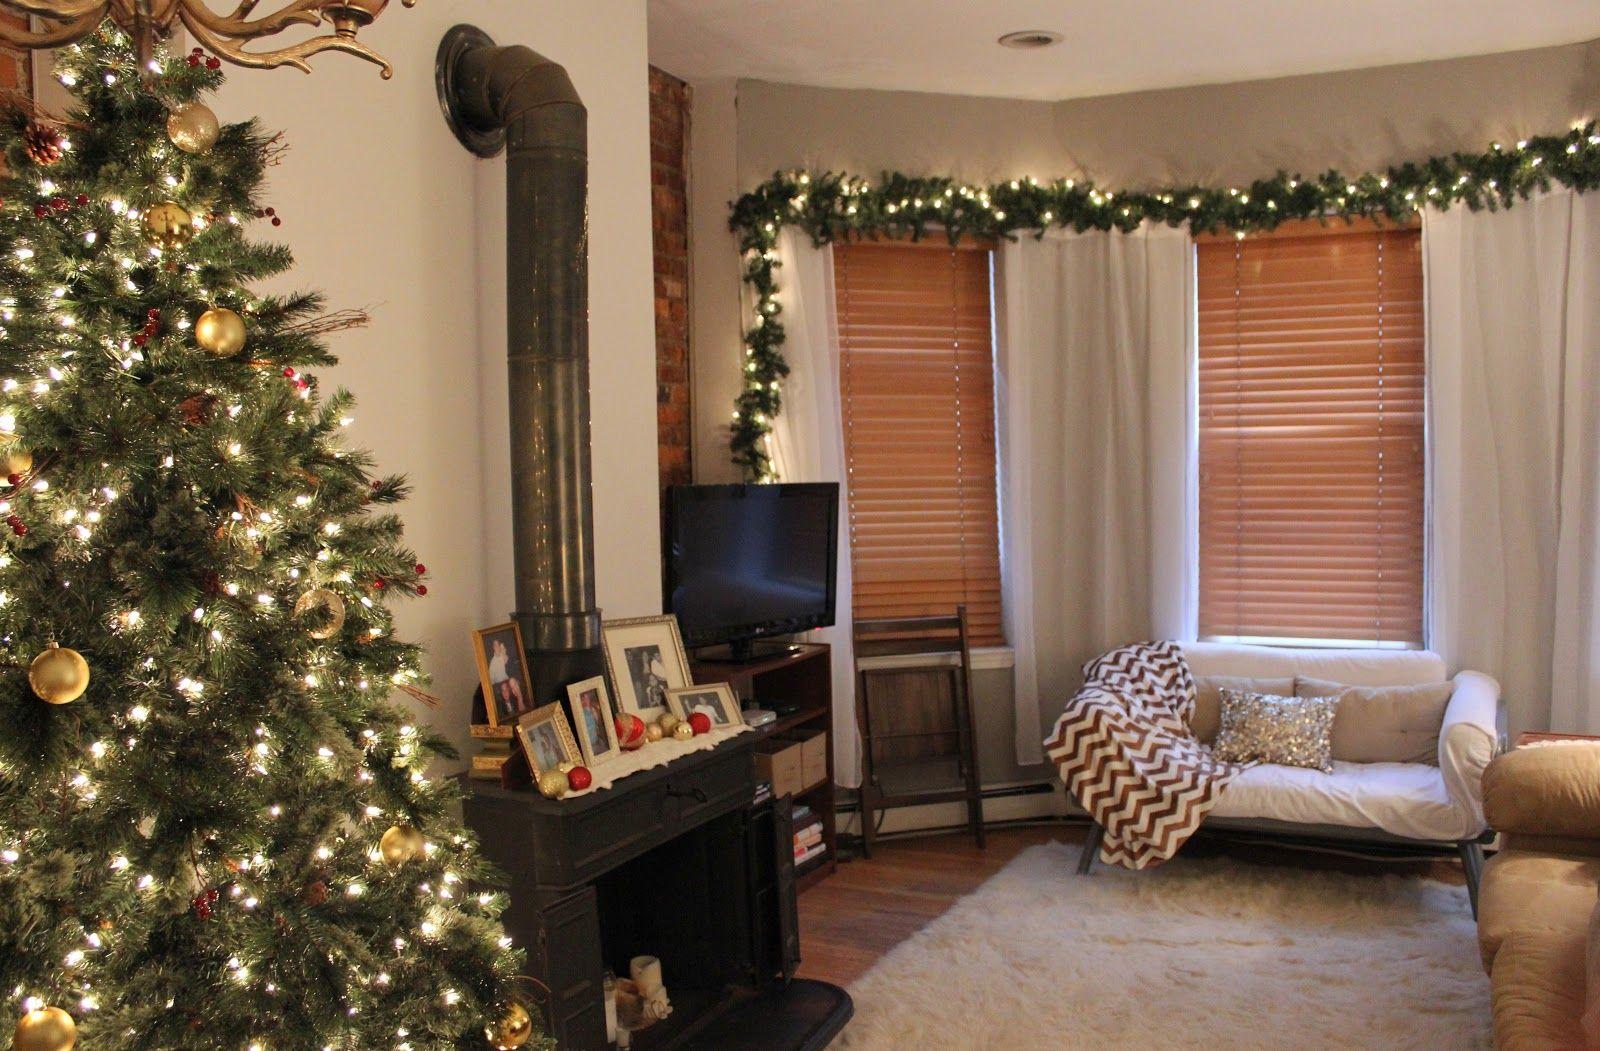 apartment holiday decor | Christmas apartment, Christmas ...